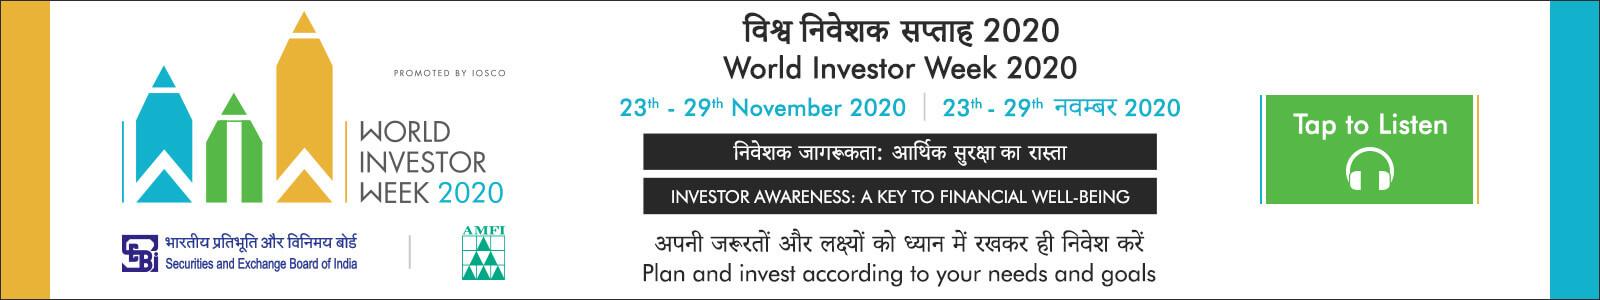 World Investor Week